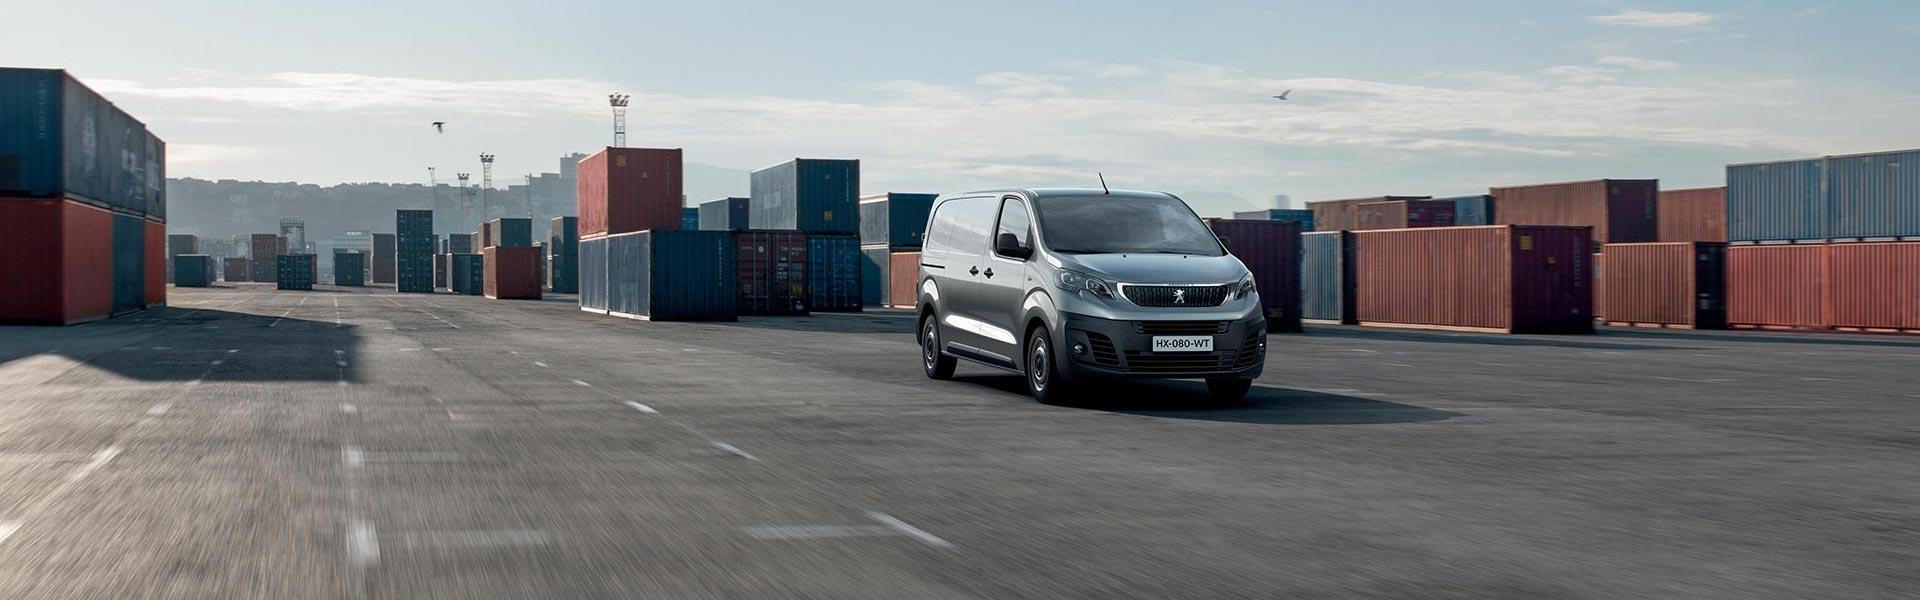 características do Peugeot Expert Combi